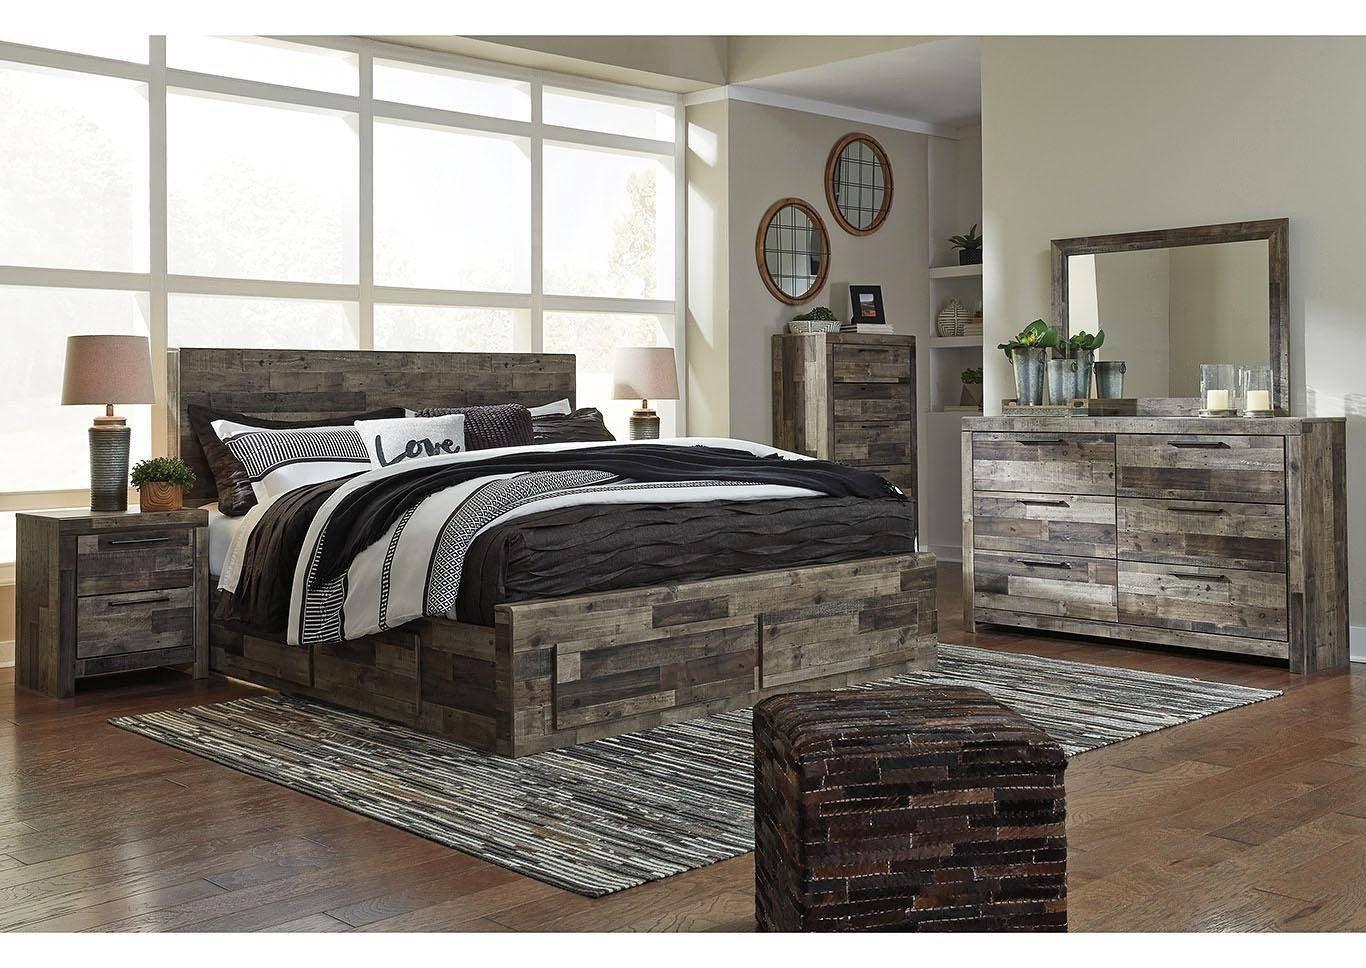 Ashley Girl Bedroom Set Inspirational ashley Derekson King Storage Bedroom Set 6 Pcs In Multi Gray Wood